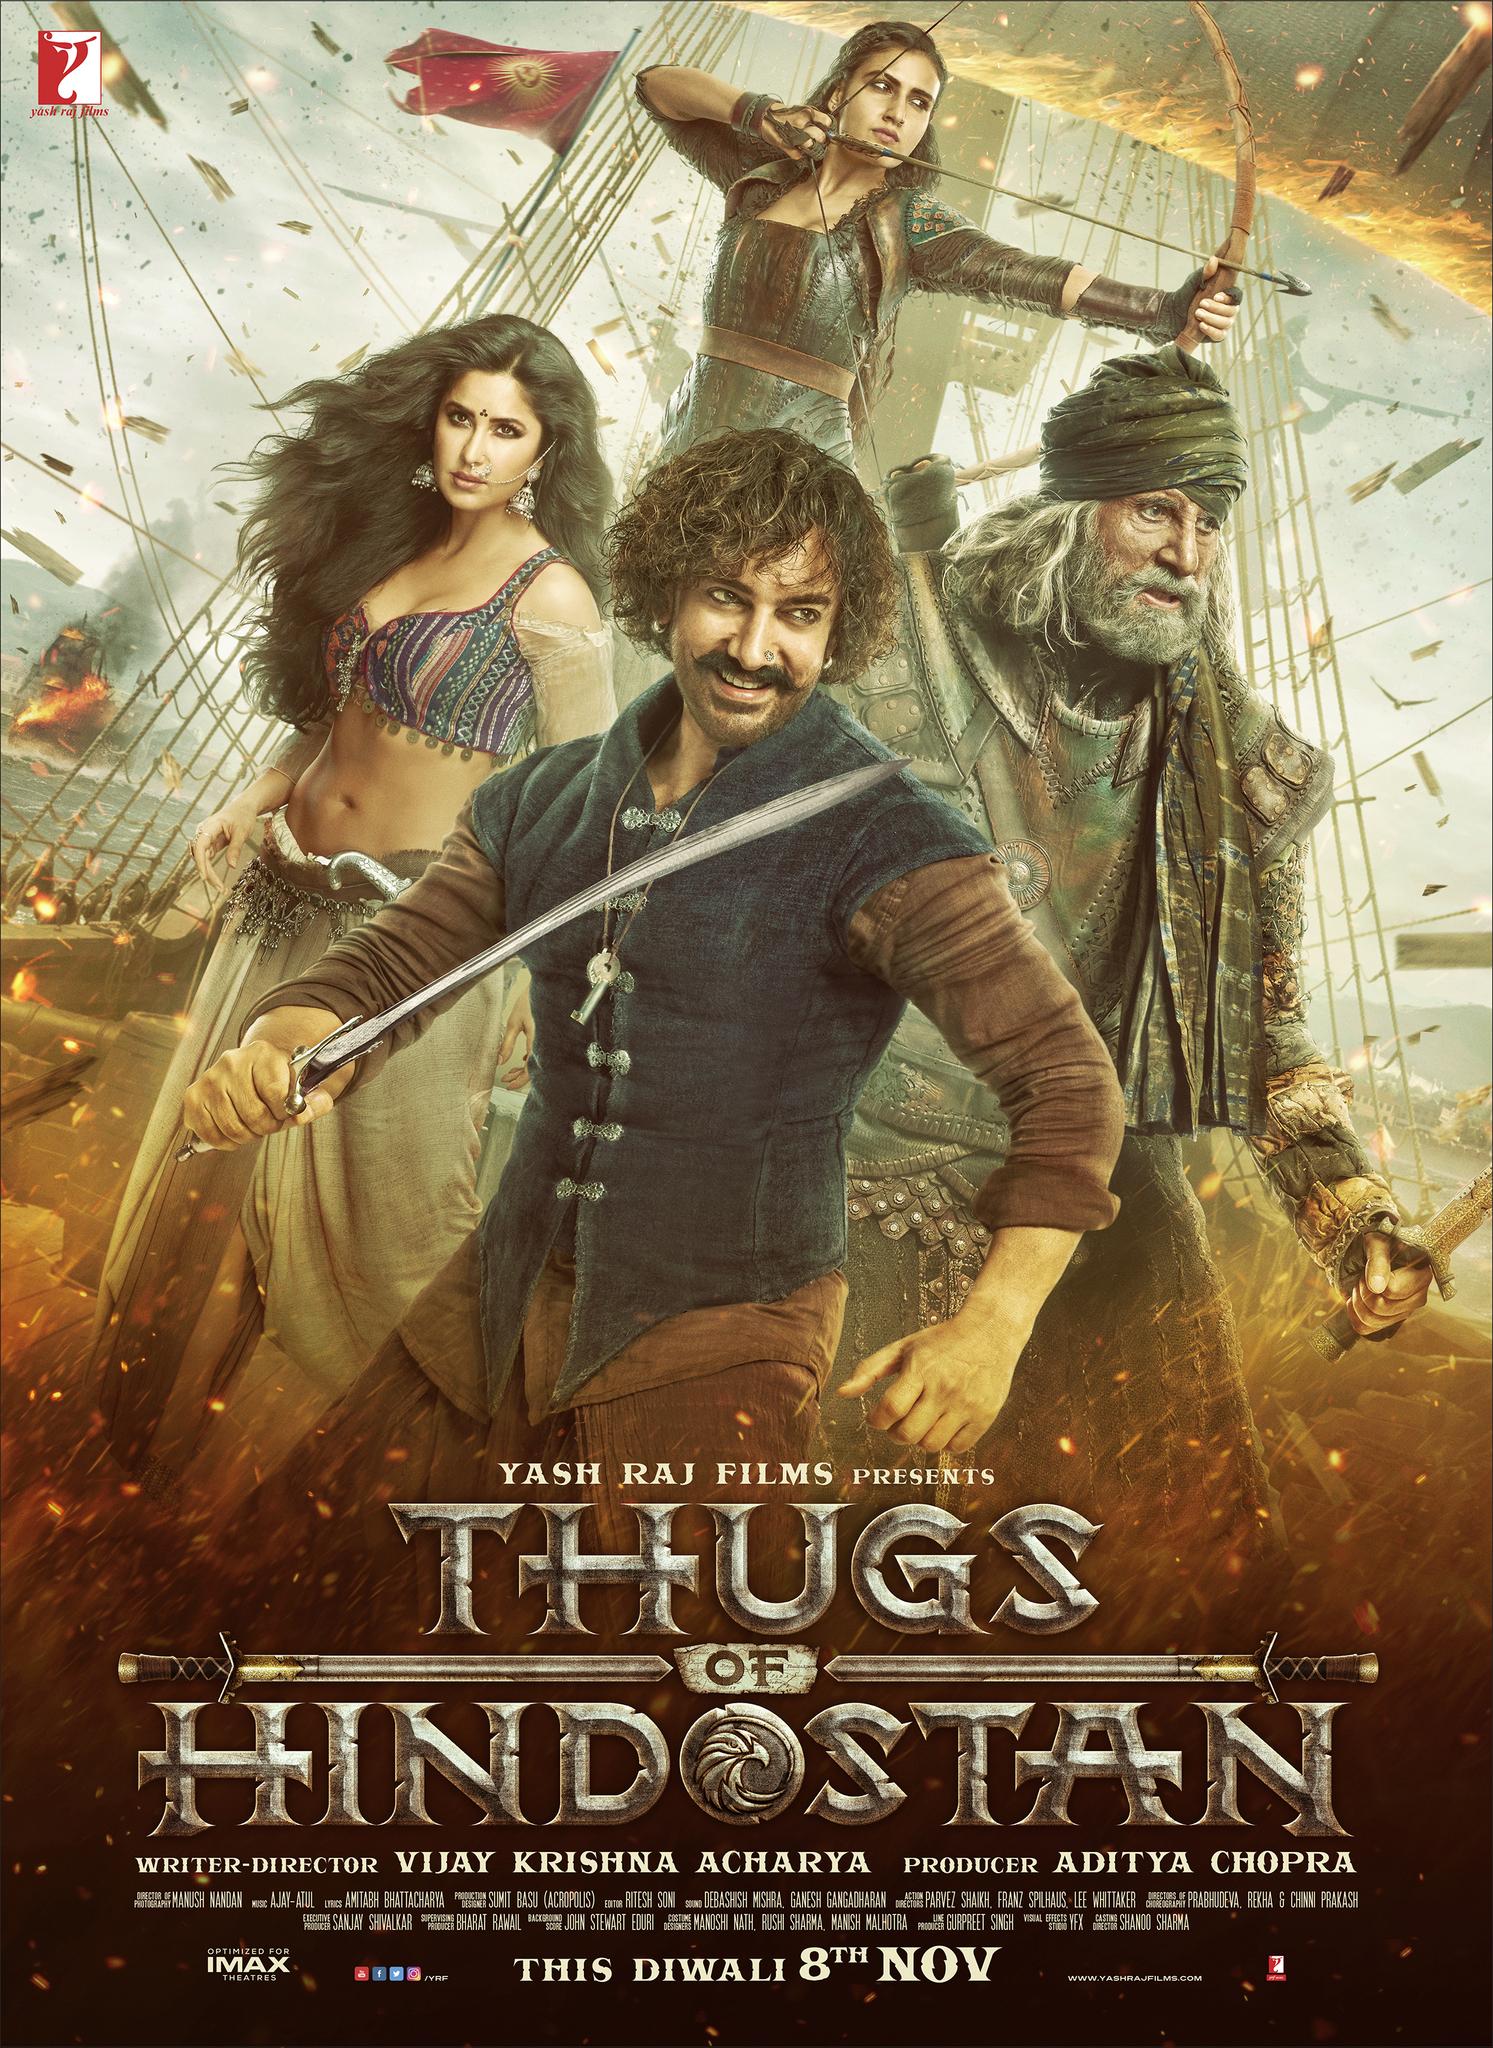 Thugs of Hindostan (2018) 1080p BluRay x265 HEVC 10bit AAC – [Walter]